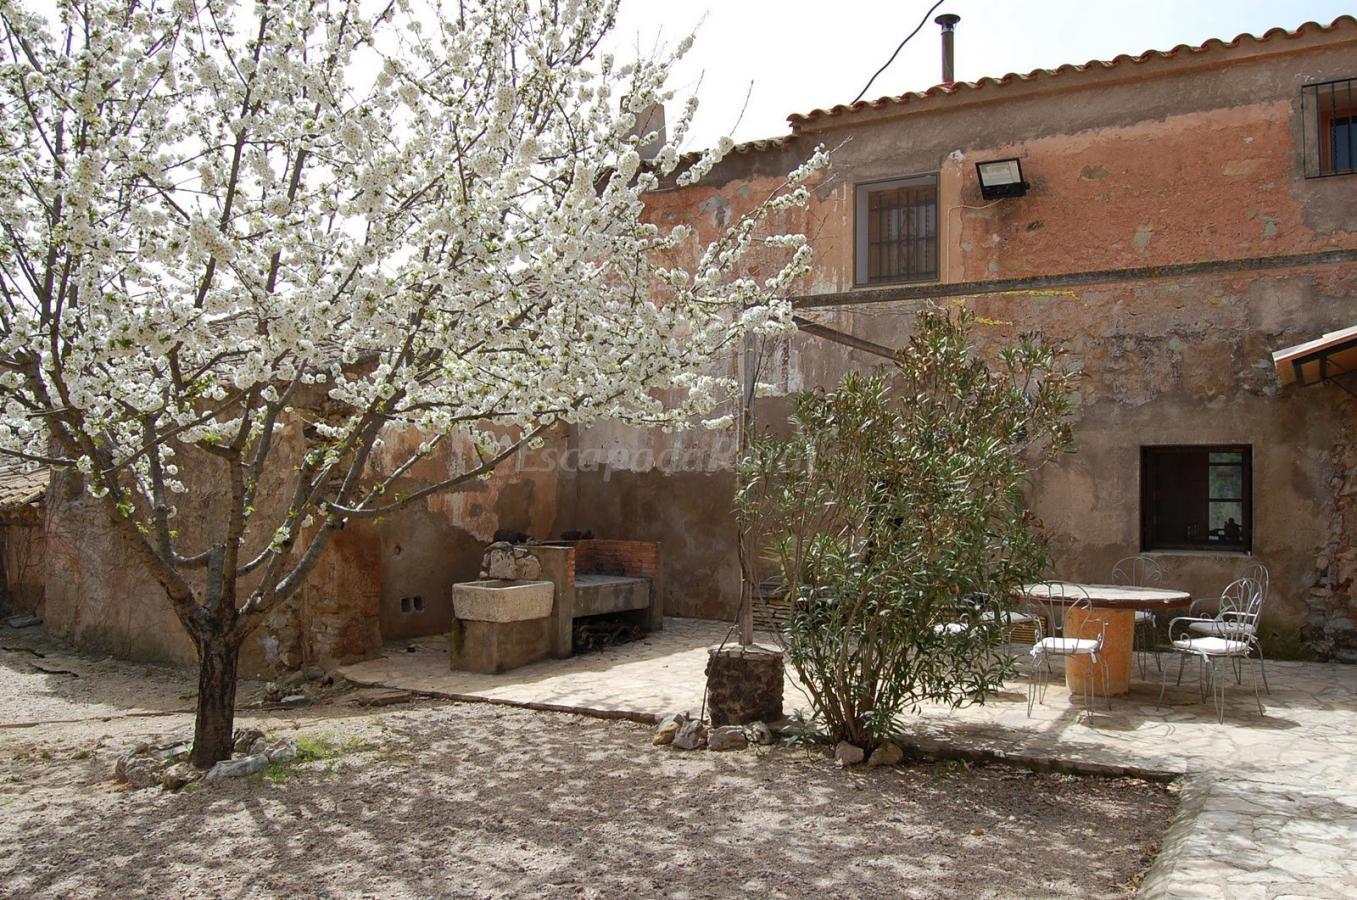 Fotos de casa rural casas de alcance casa de campo - Casa de campo en valencia ...